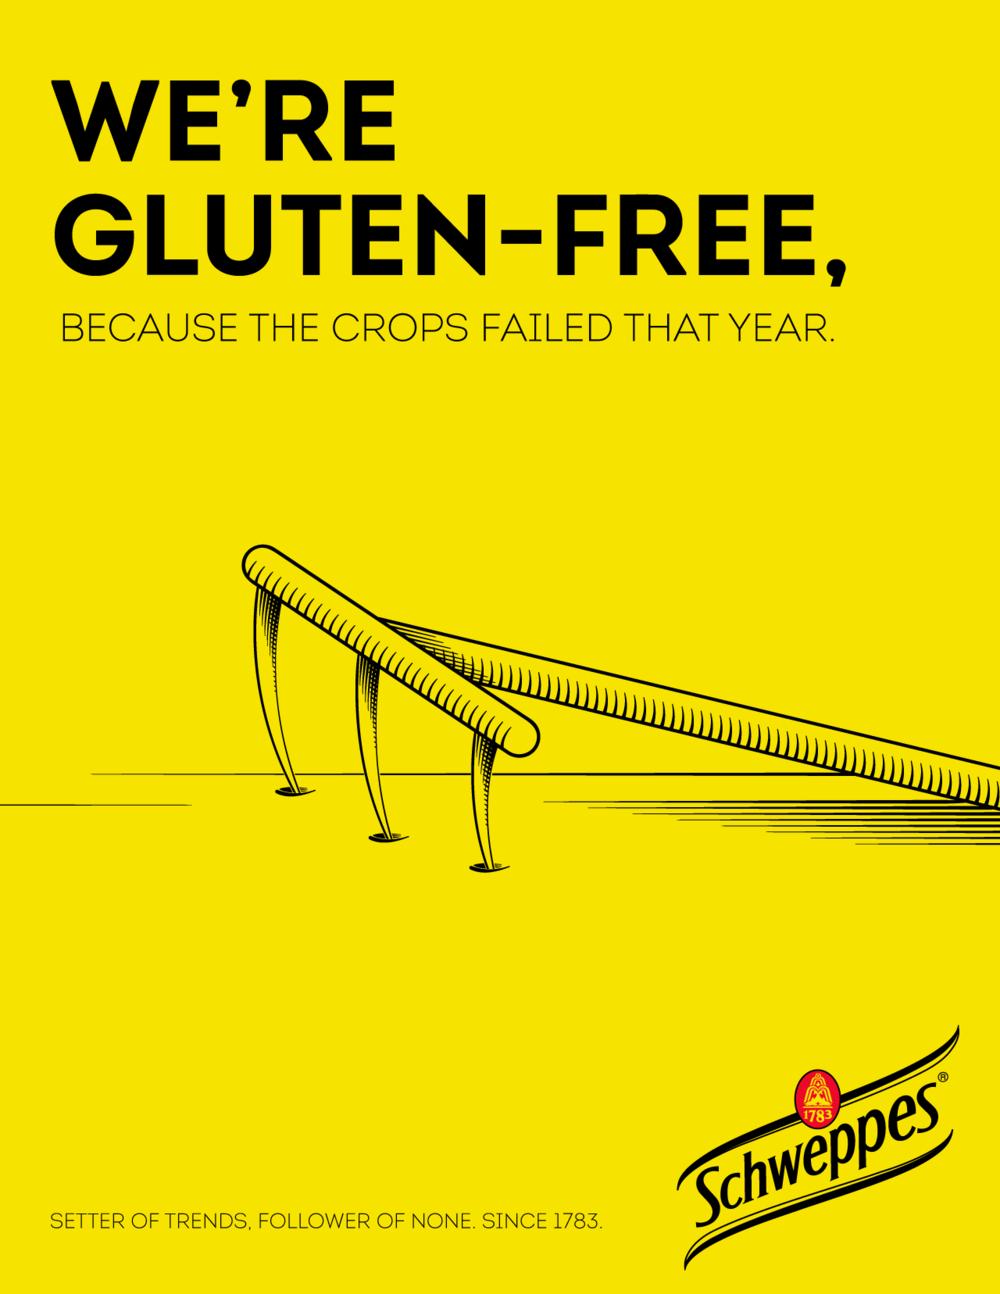 schweppes-gluten new.png